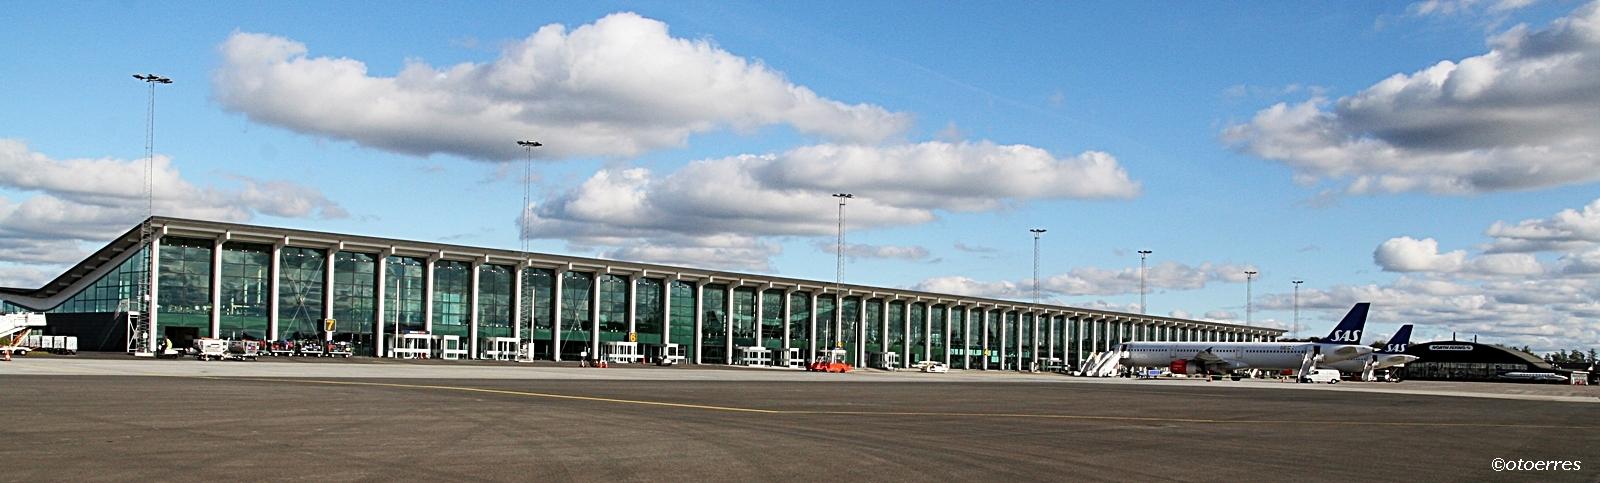 Danmar - Aalborg lufthavn - SAS - Airbus